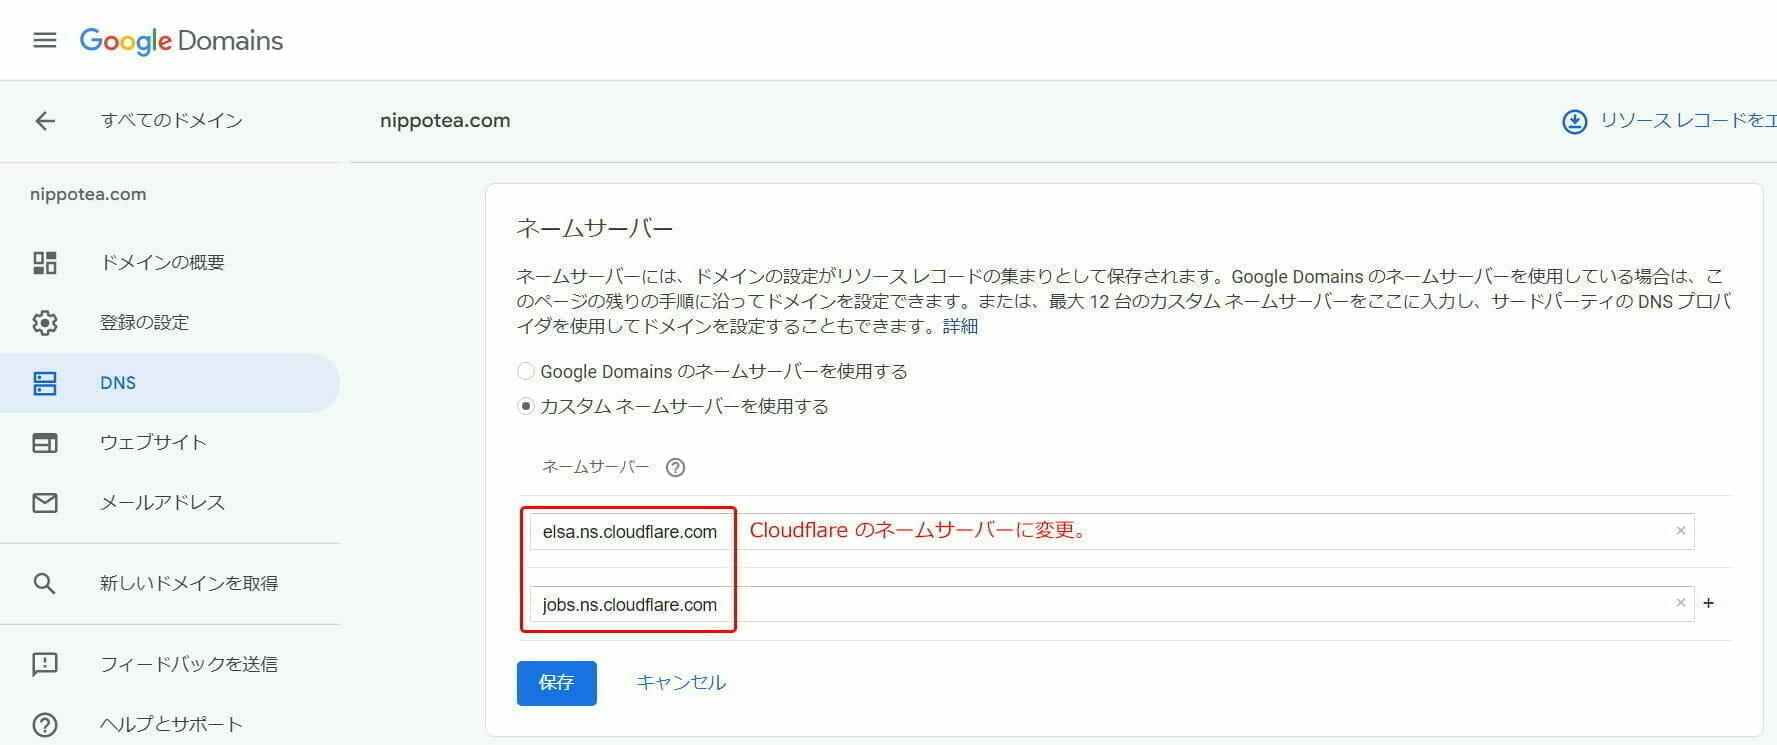 Cloudflare 設定:Google Domain のネームサーバー の変更